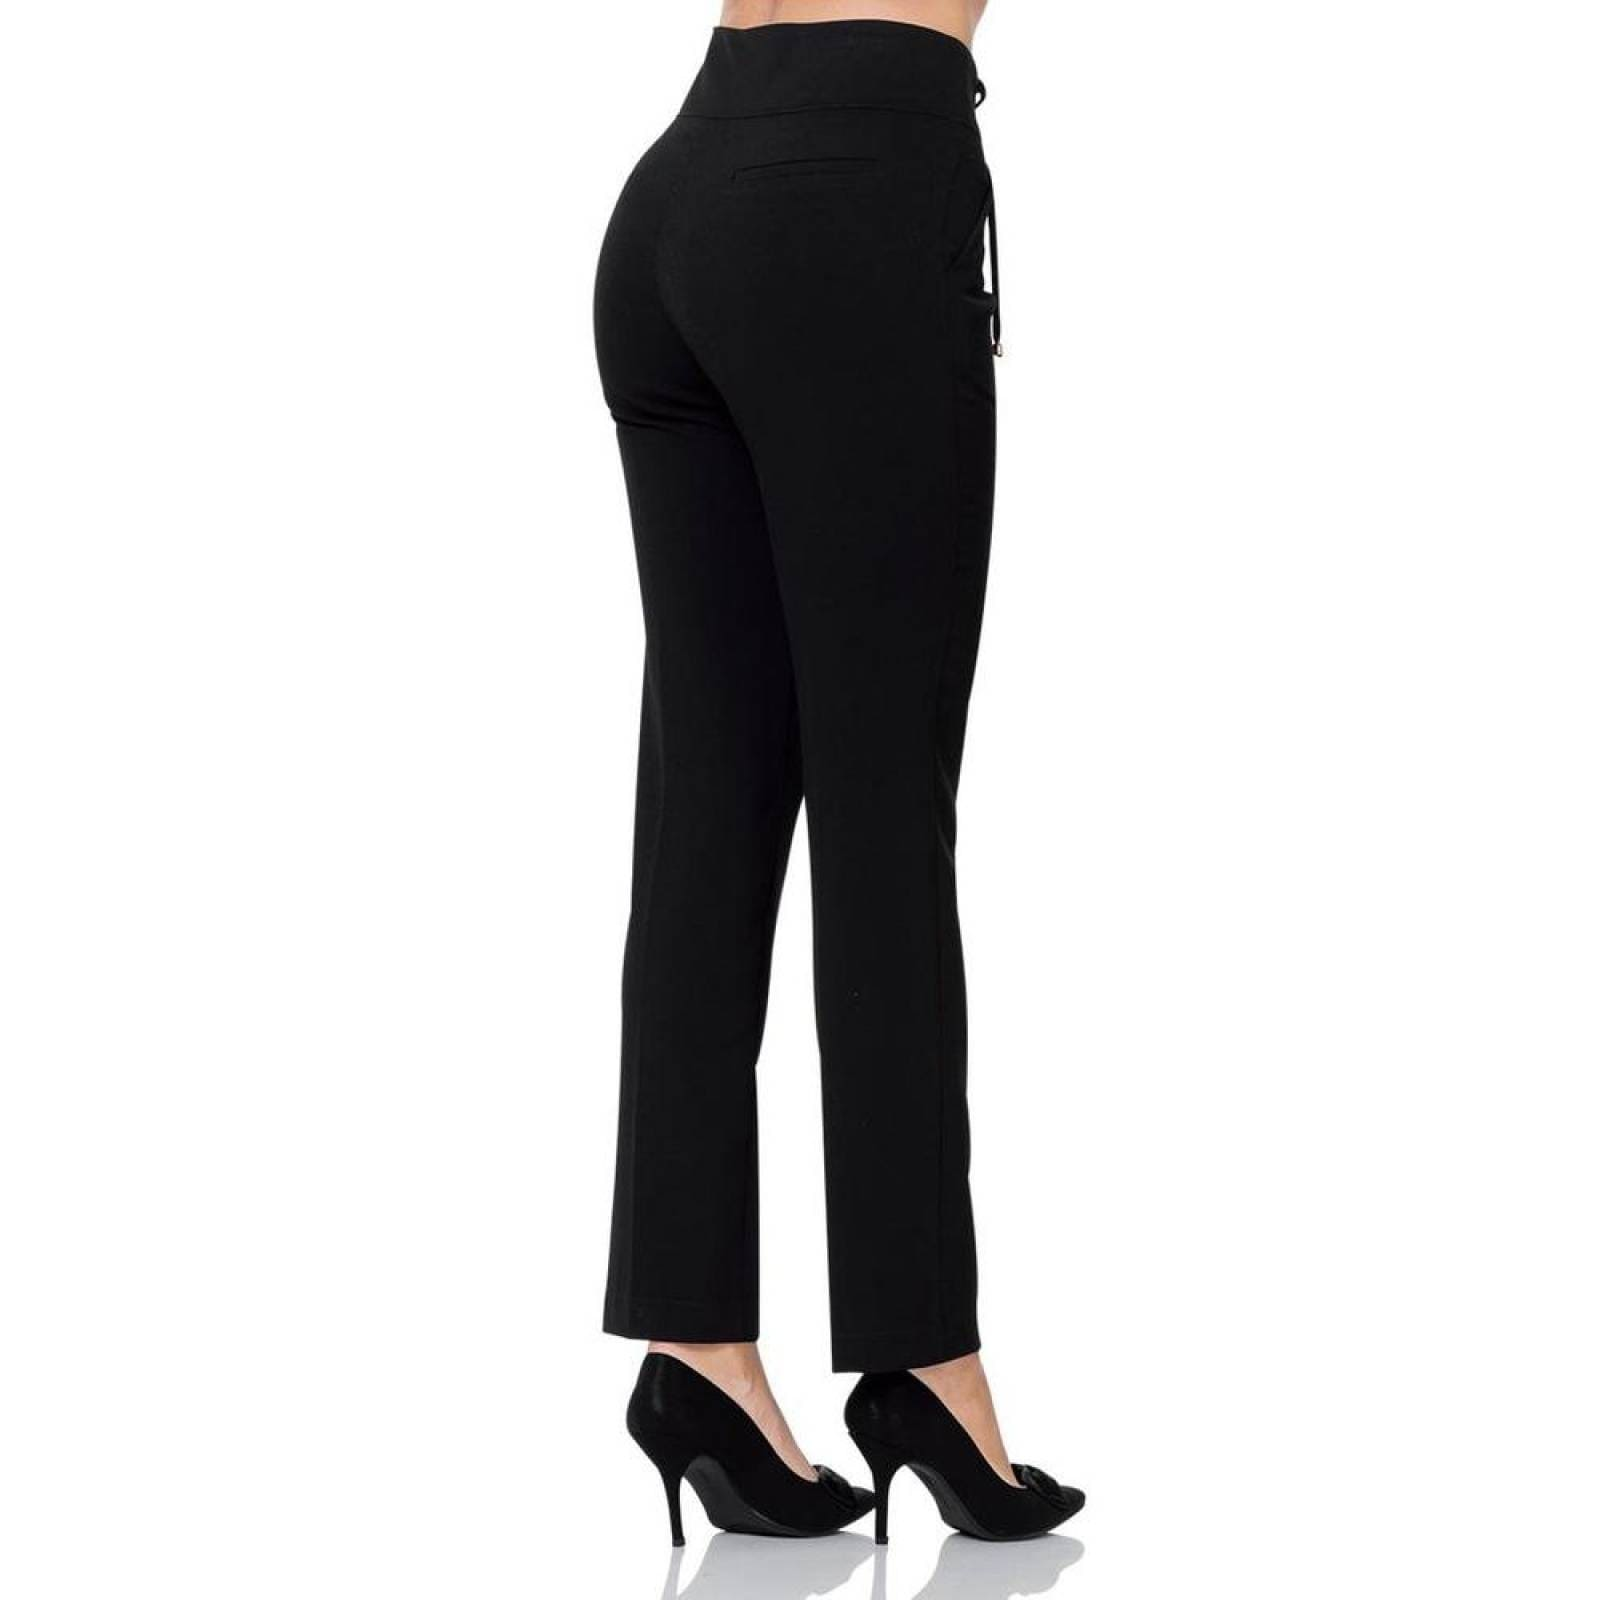 Pantalon De Vestir Barbary Mujer Negro Spandex J 1145